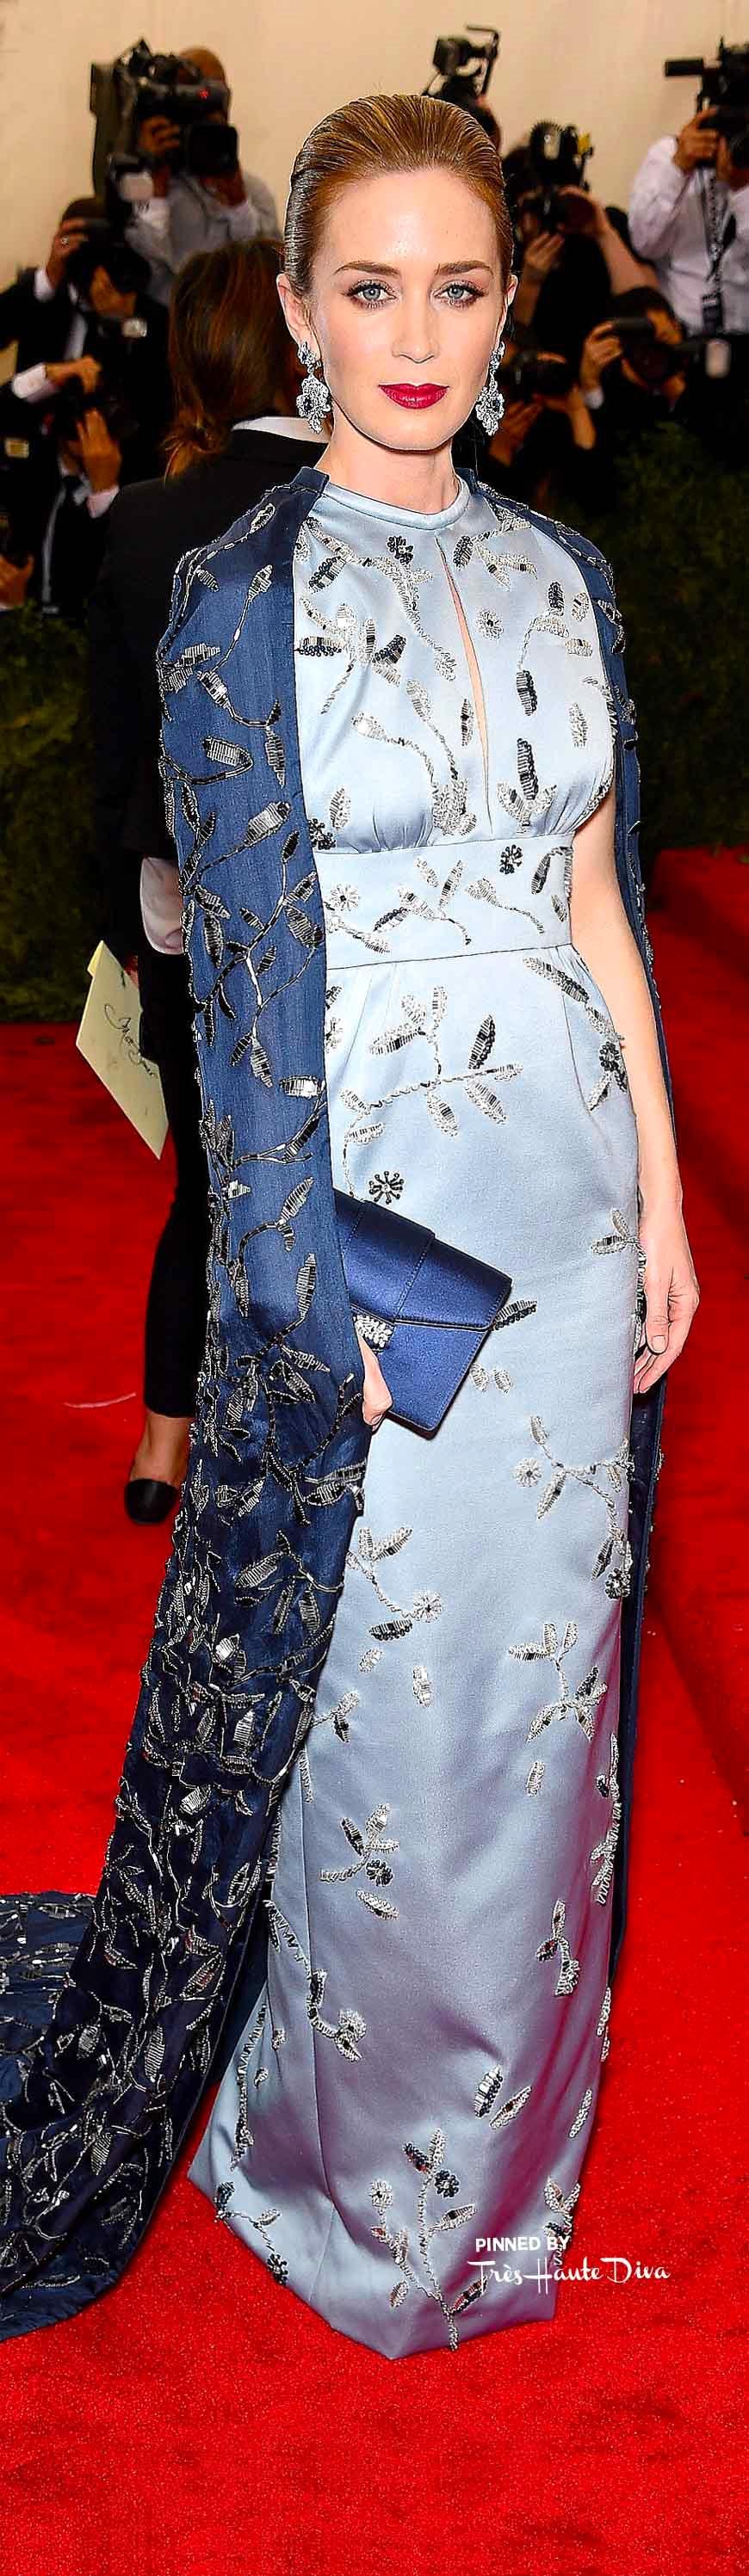 Emily Blunt in Prada Getty Images/ Dimitrios Kambouris